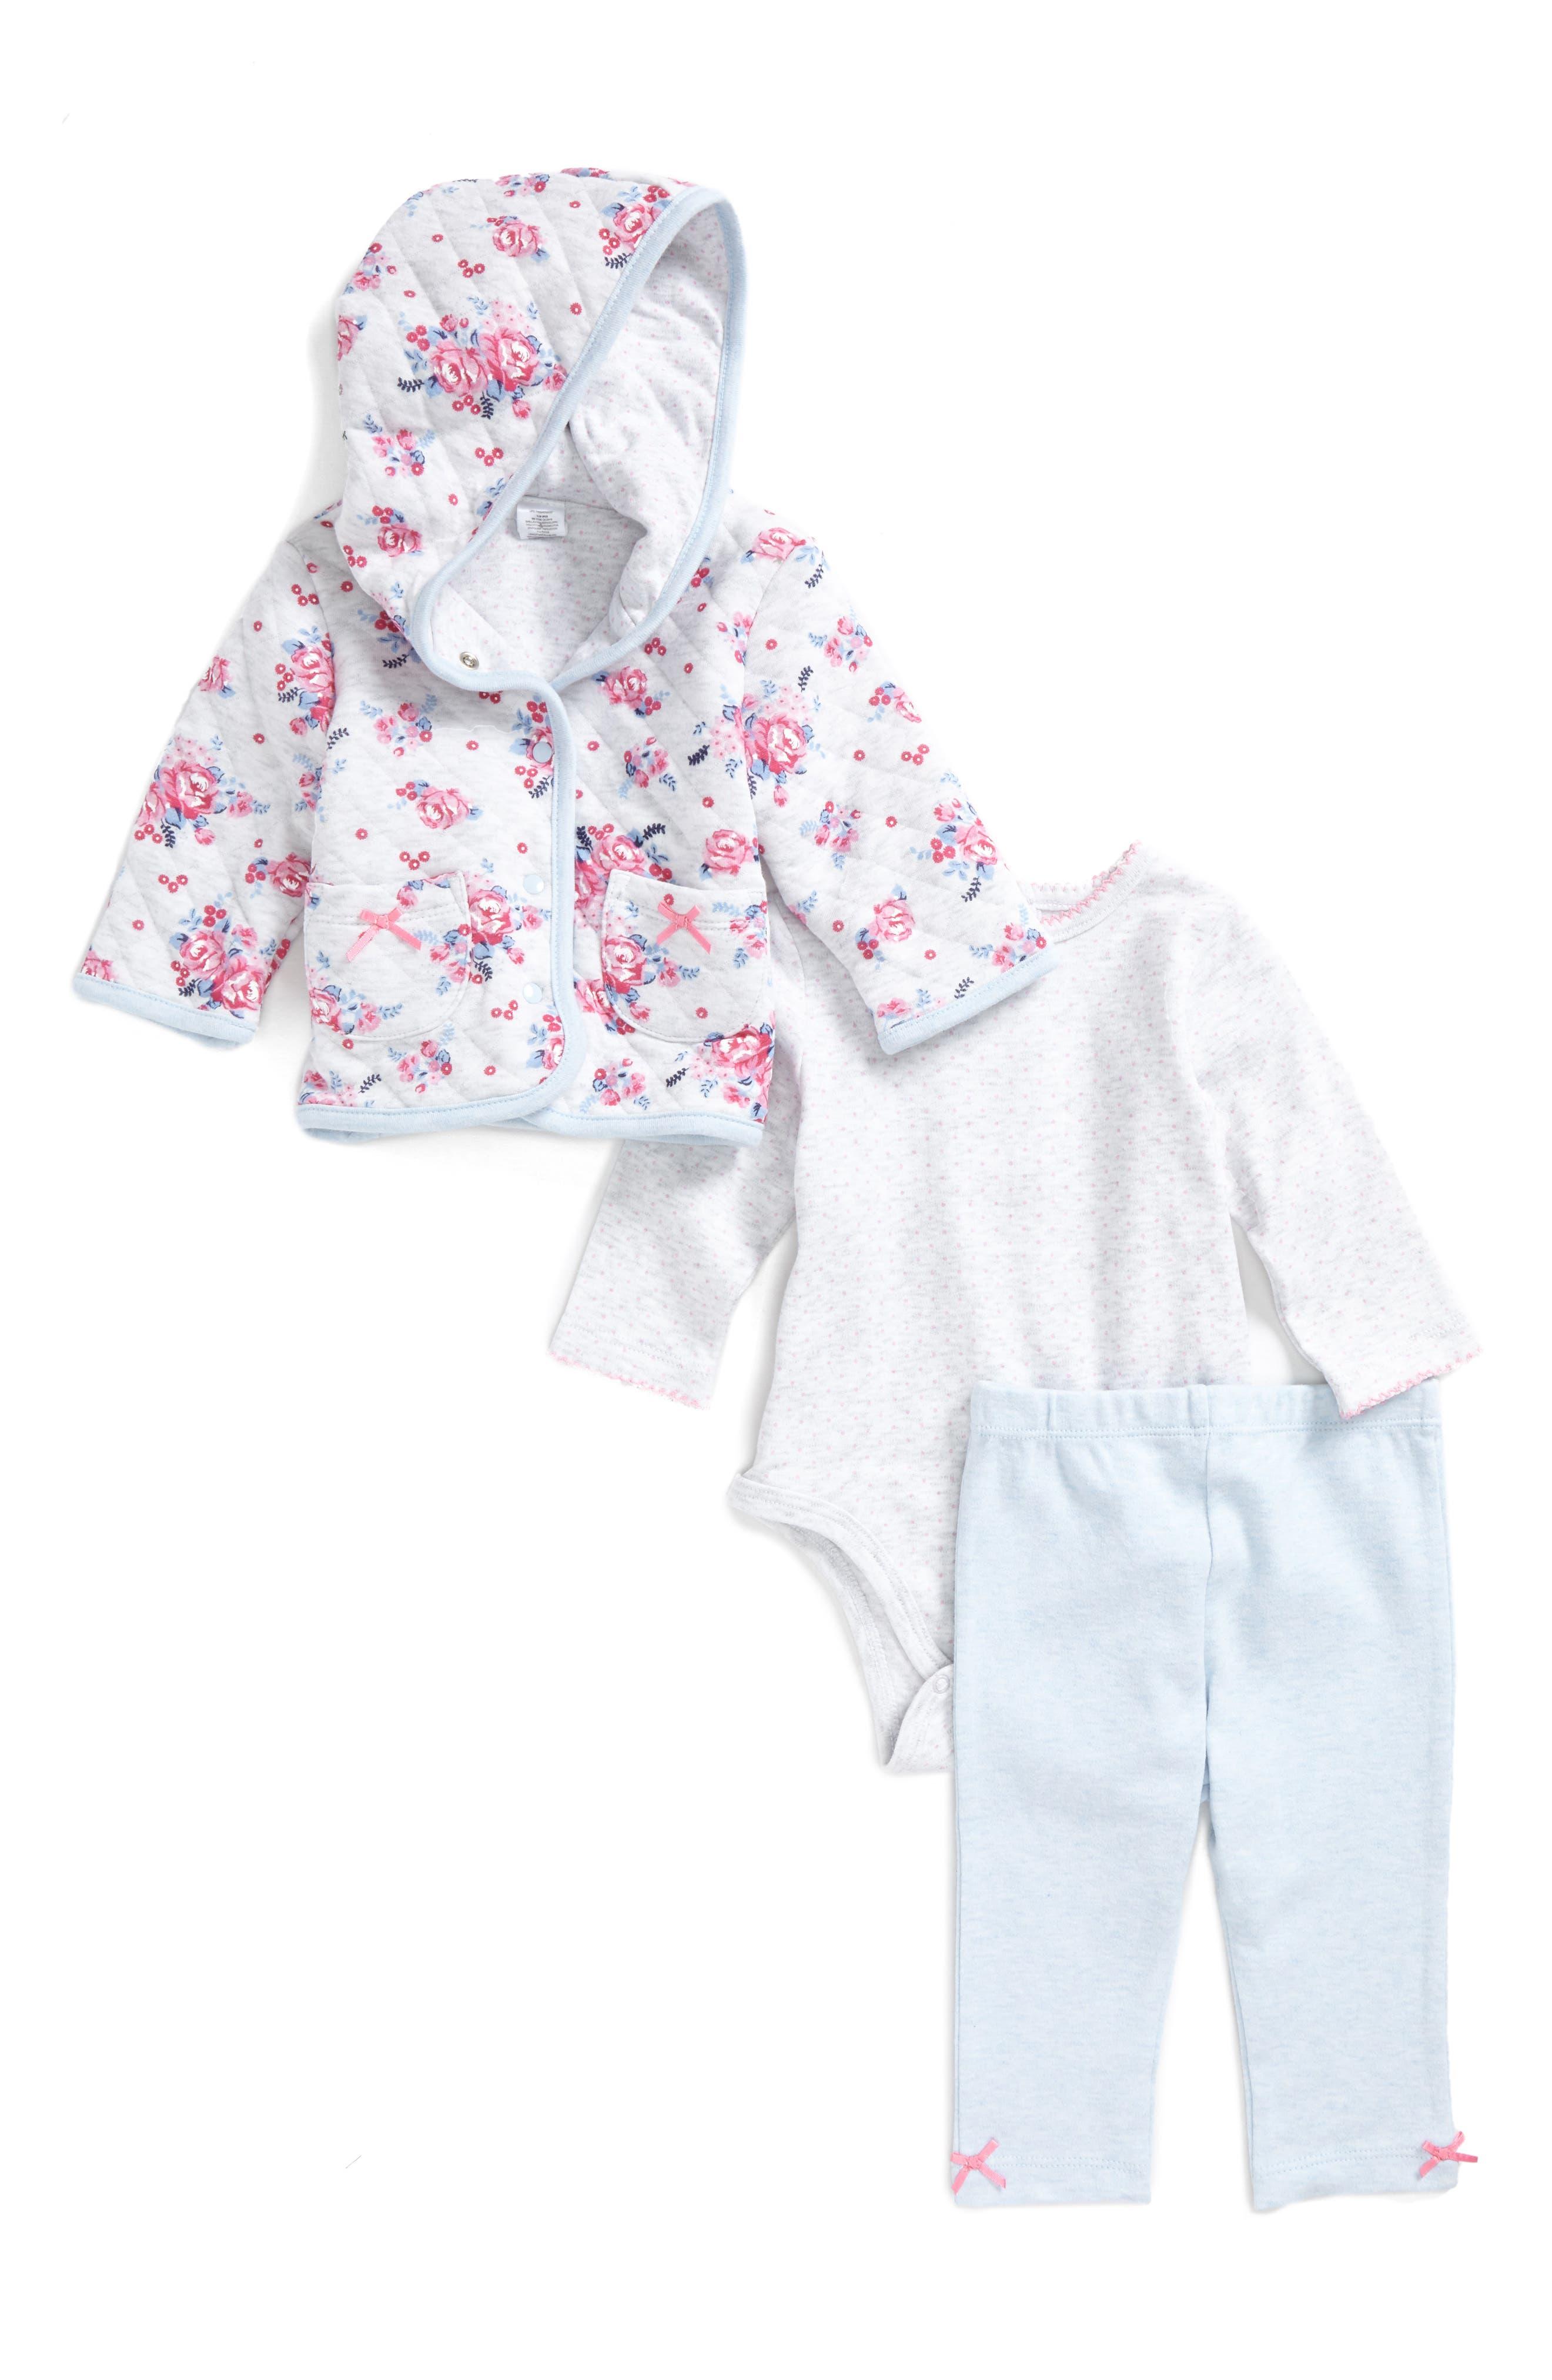 Main Image - Little Me Rose Dot Quilted Hoodie Bodysuit & Leggings Set (Baby Girls)